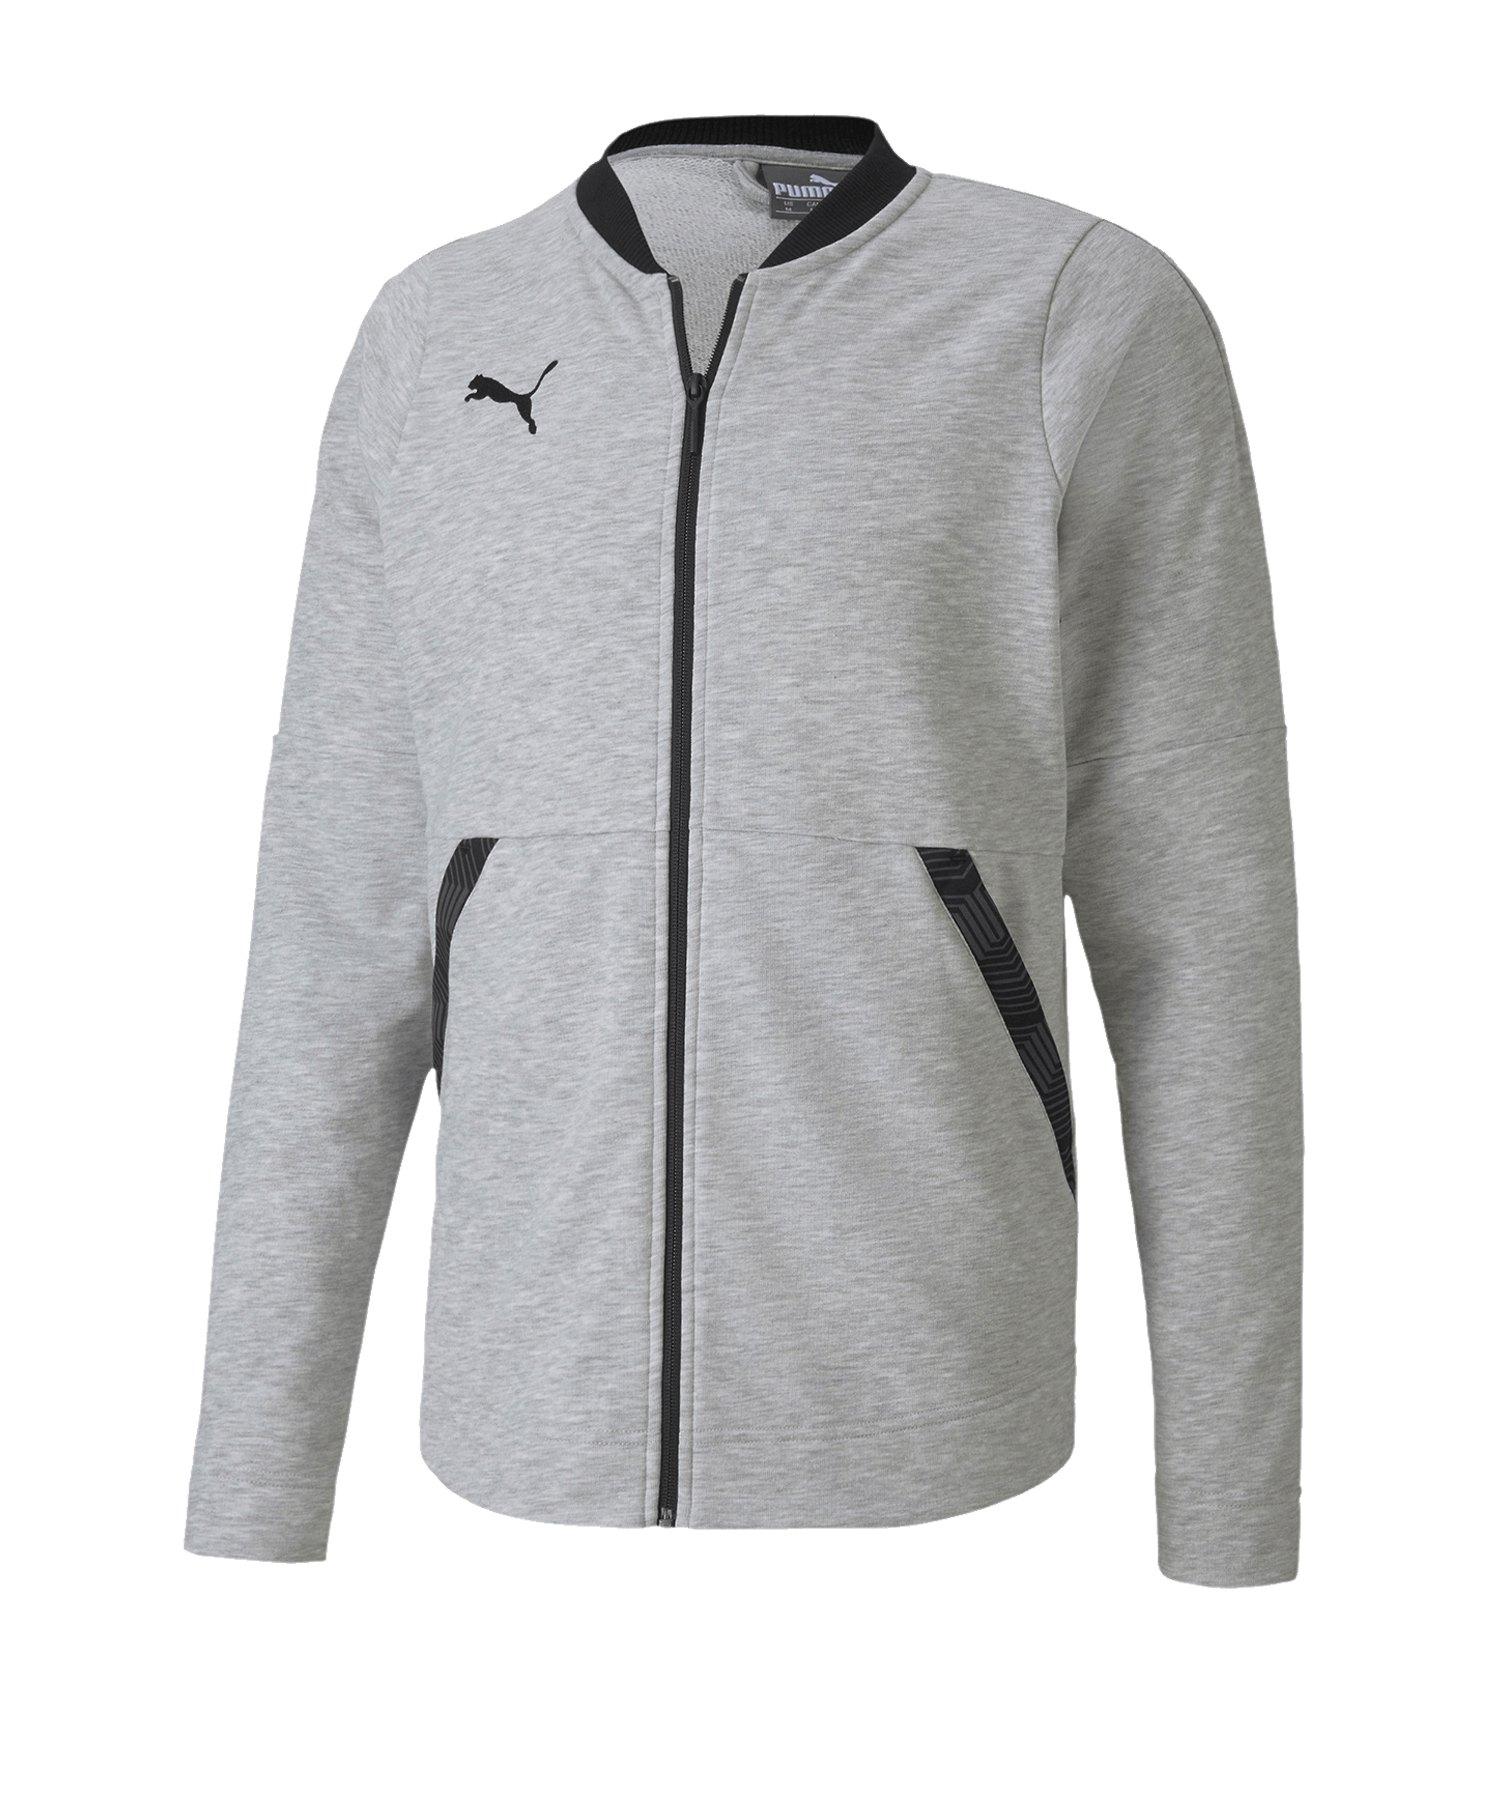 Puma teamFINAL 21 Casuals Jacket Jacke Grau F37 - grau